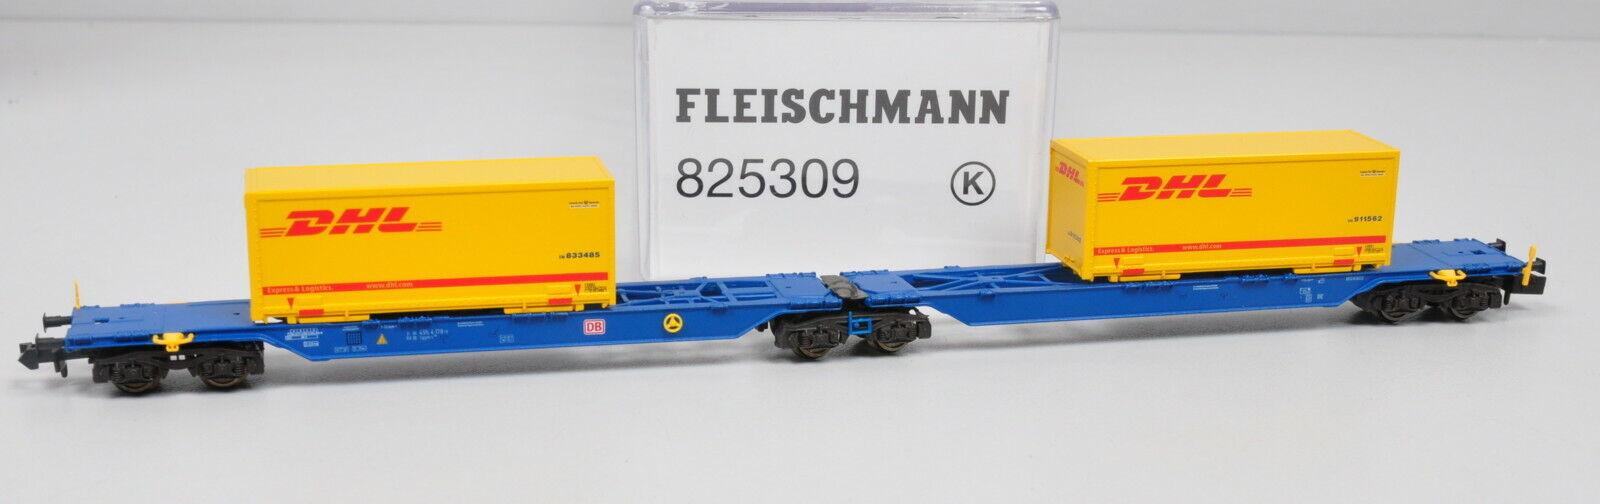 2tlg. Fleischuomon Piccolo 825309 Container Vagone Sggmrs 714715  Nuovo